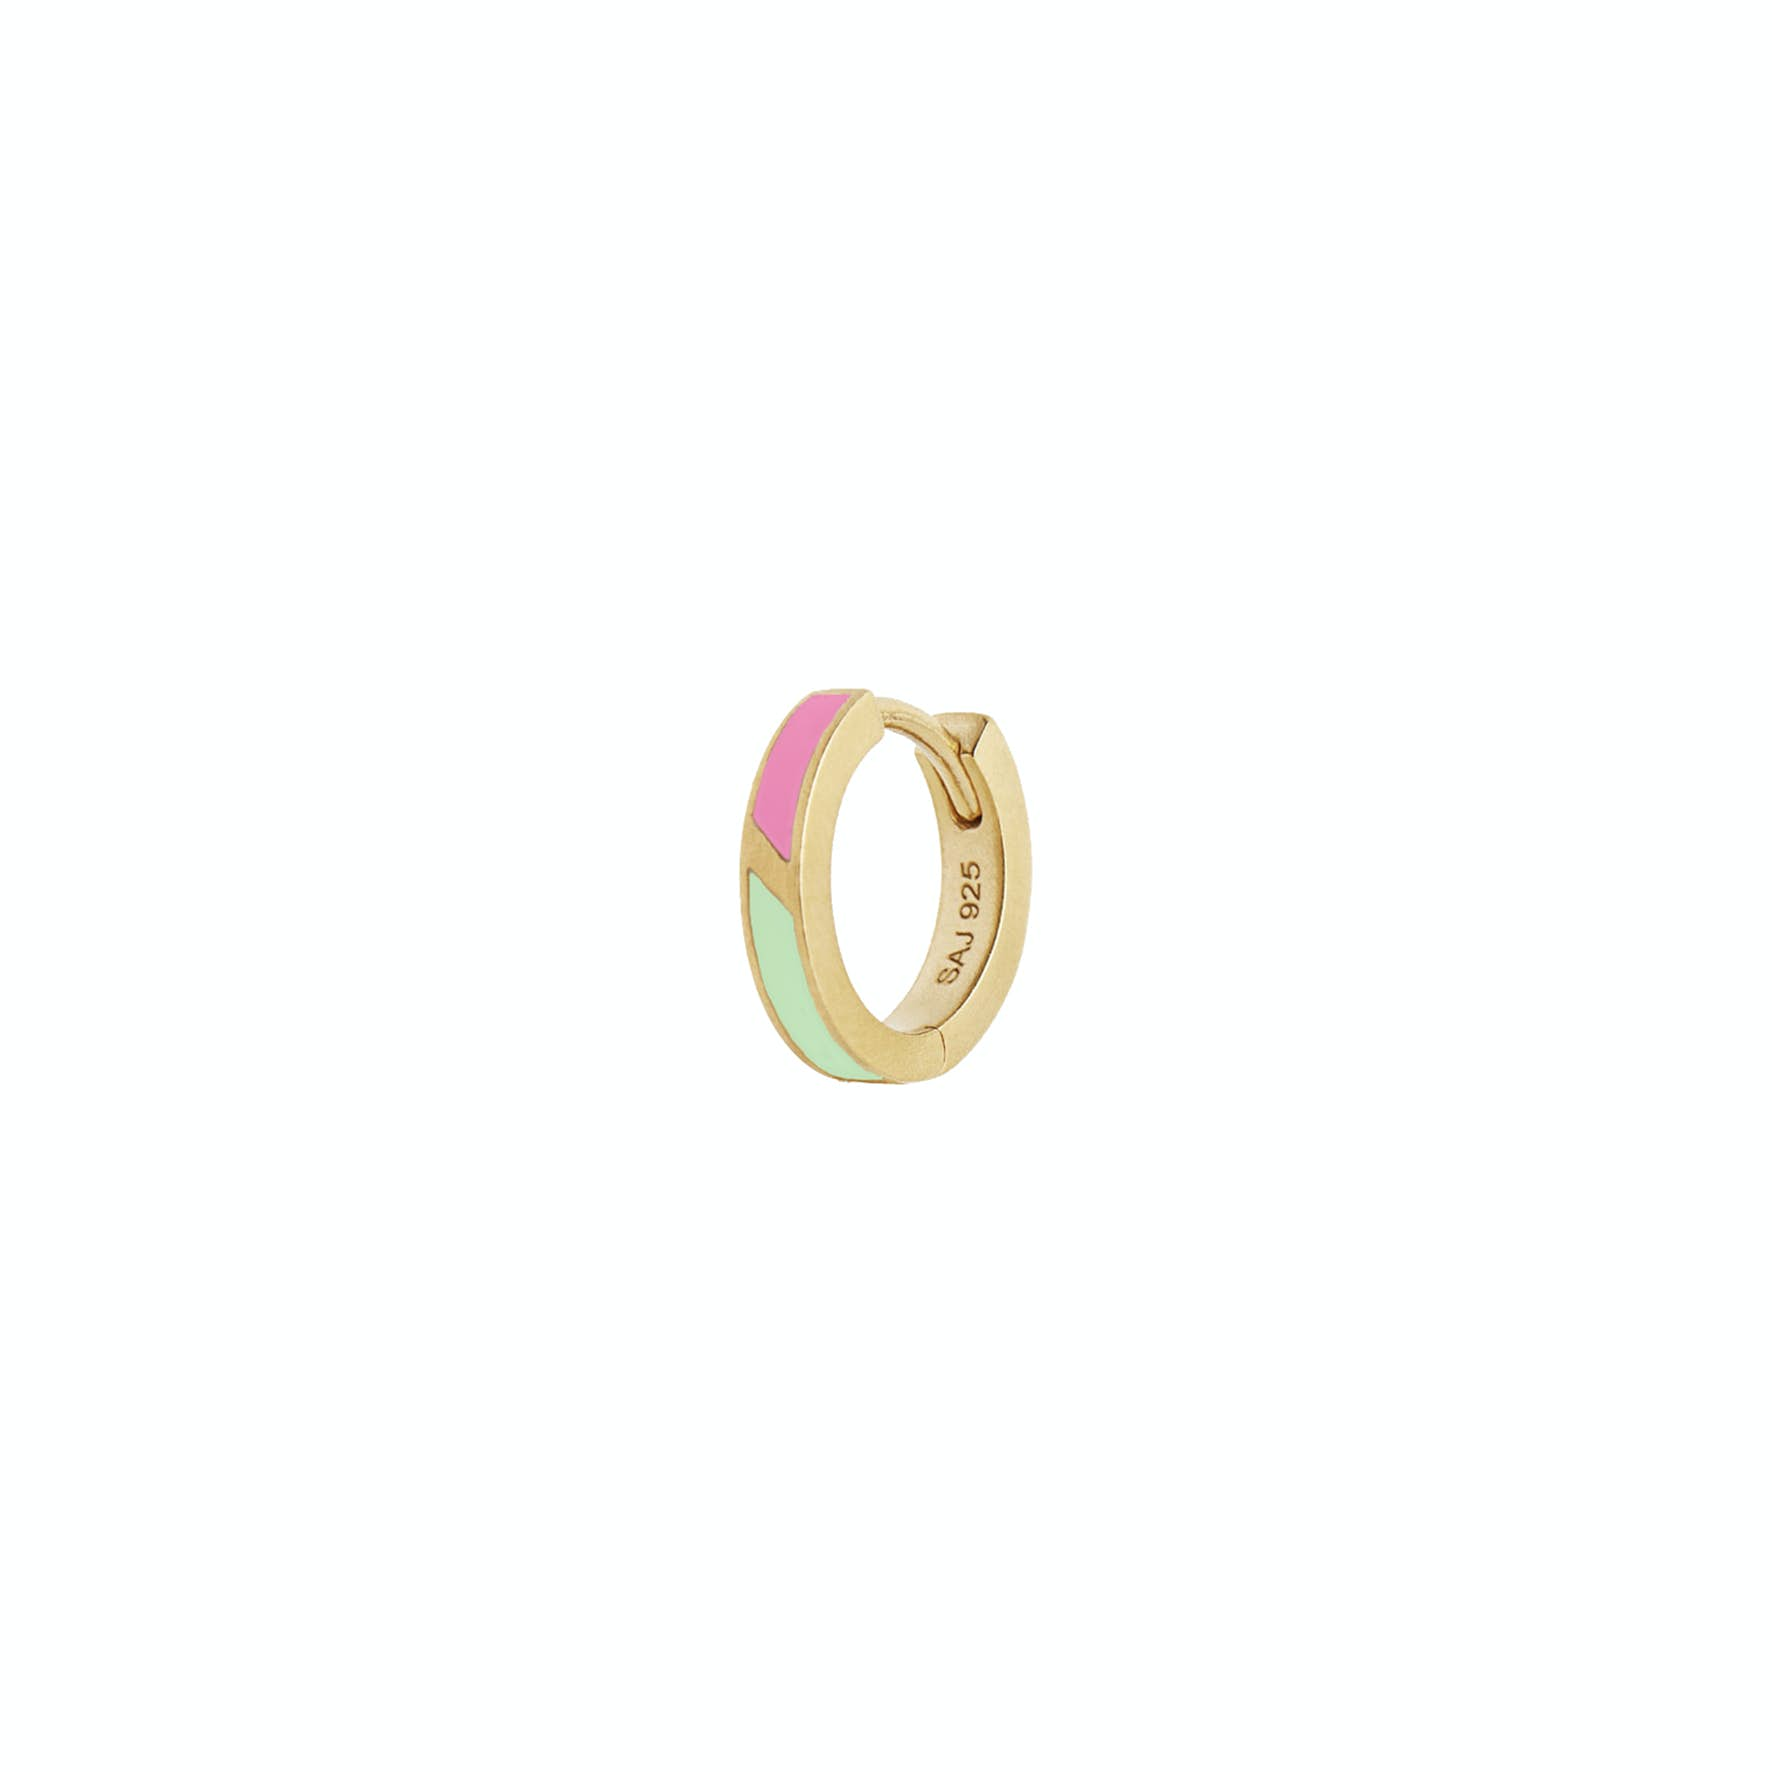 Petit Circus Huggie Earring Fresh Pink & Mint Green Enamel fra STINE A Jewelry i Forgyldt-Sølv Sterling 925